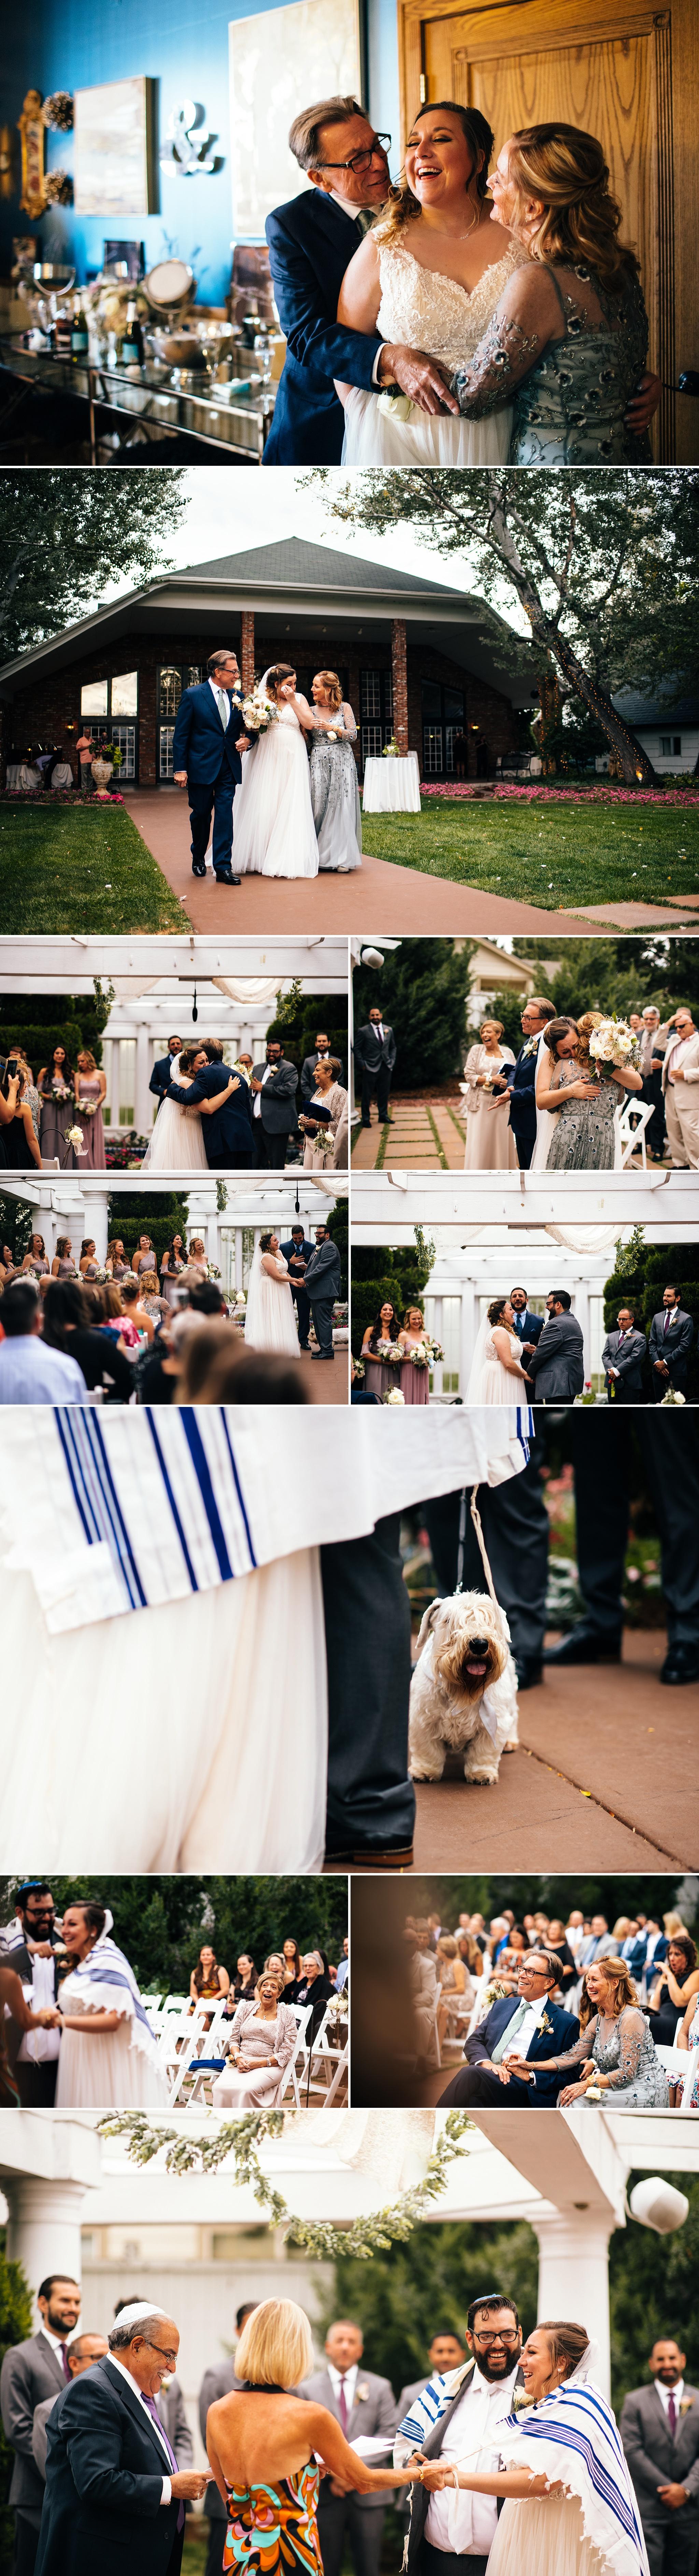 Gloria+Ross-Lionsgate-Event-Center-Wedding-0030_WEB.jpg